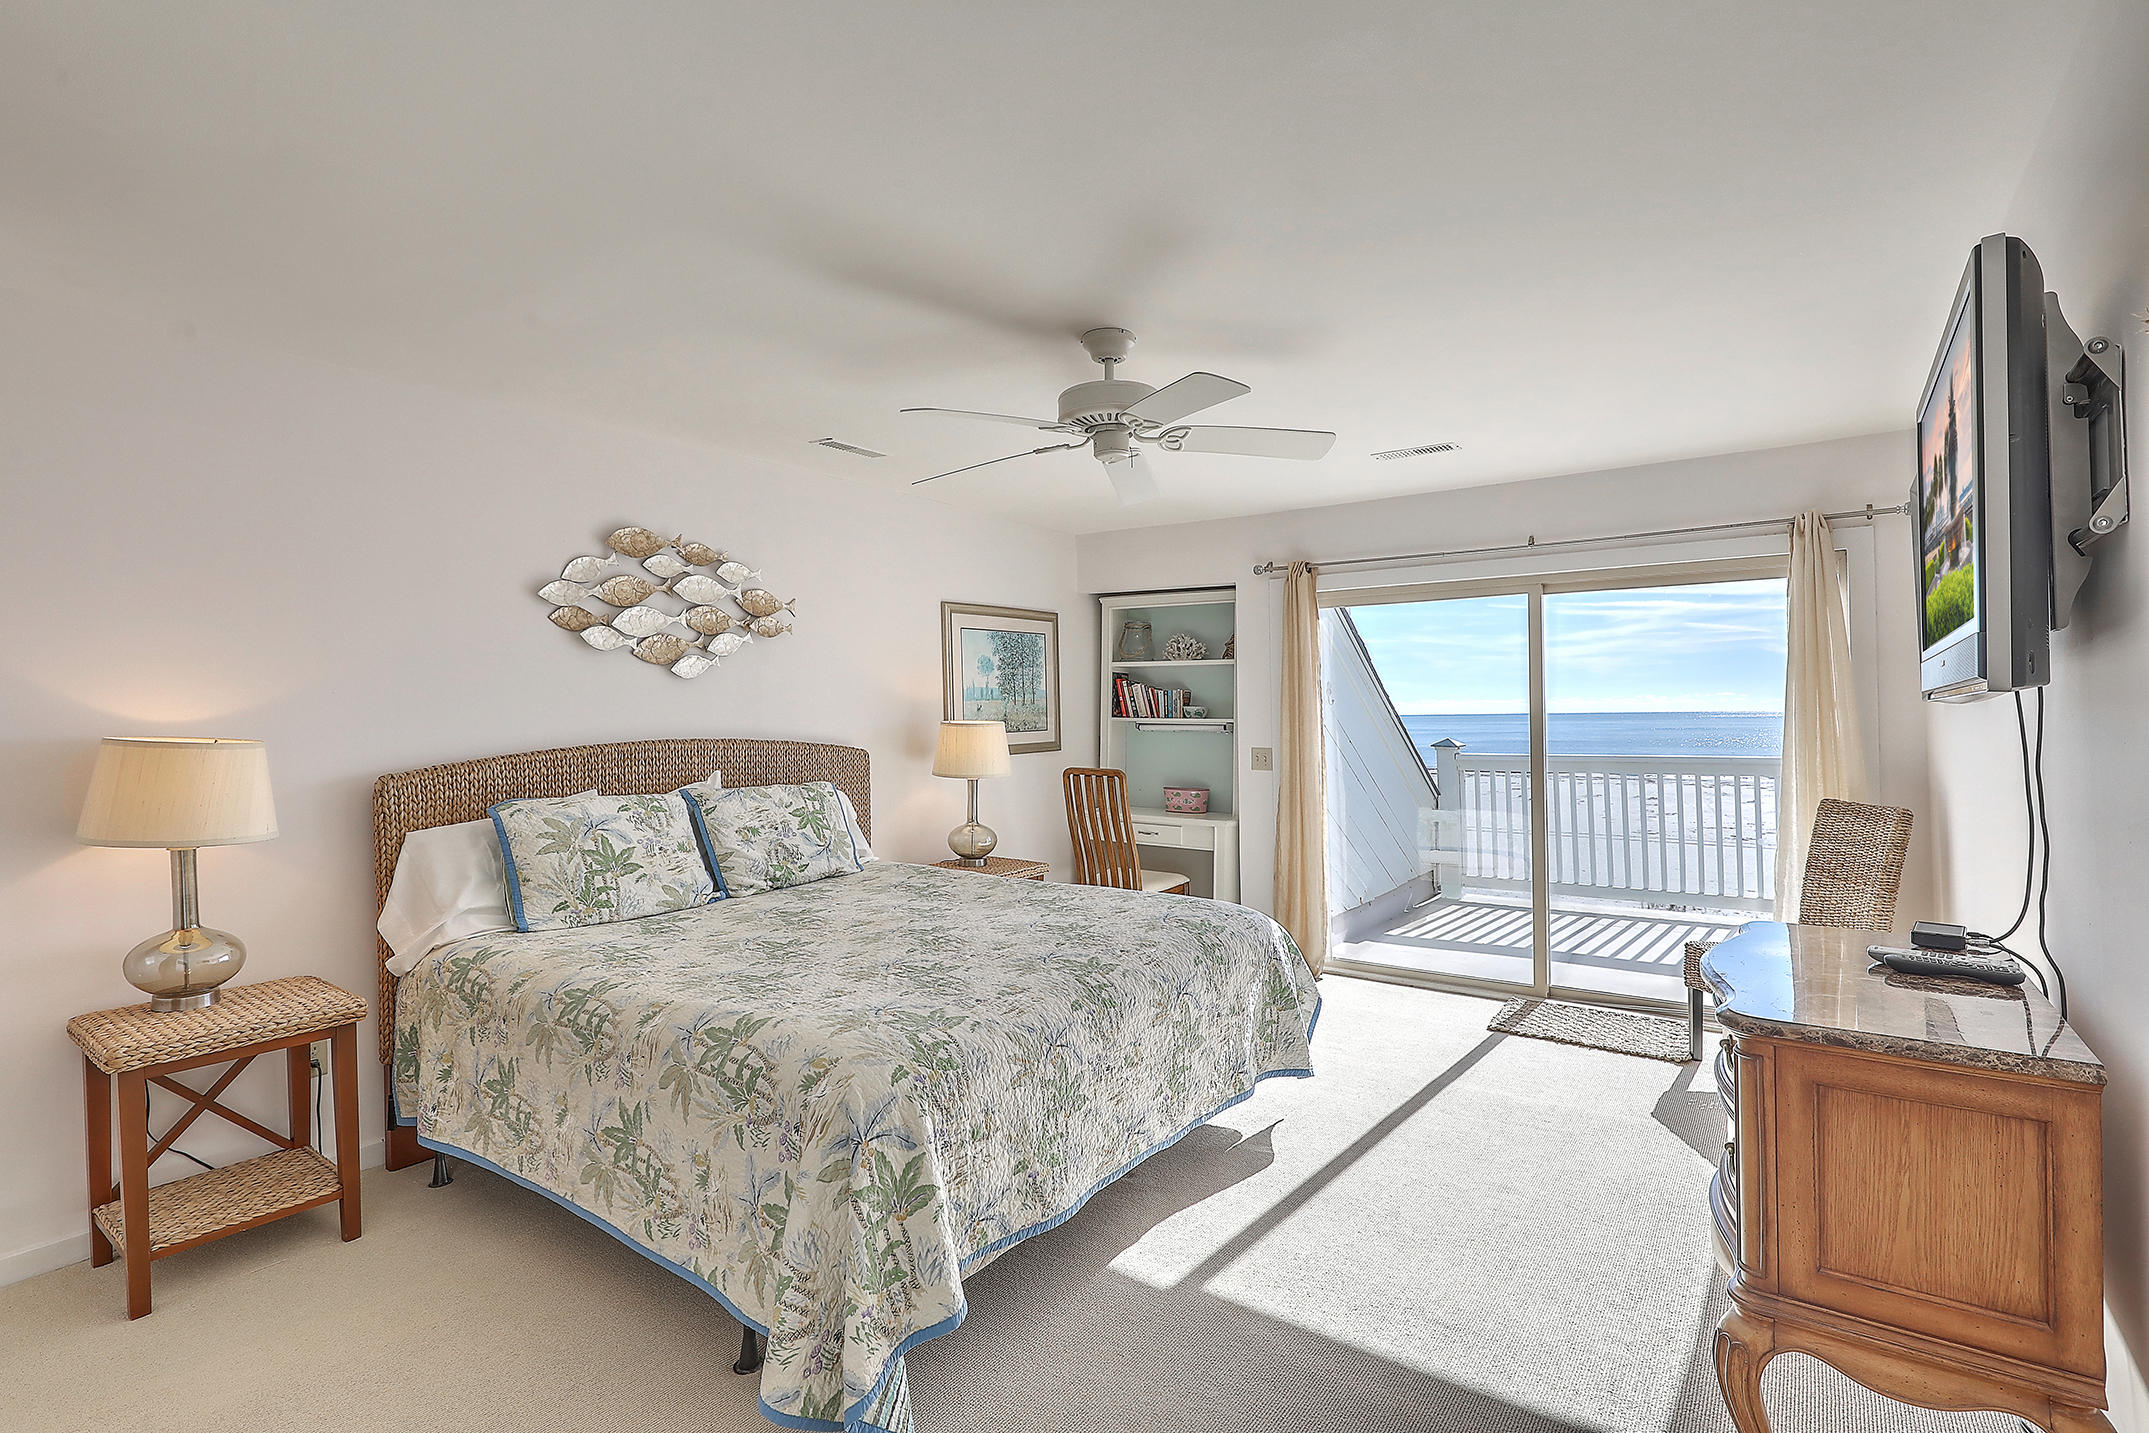 Wild Dunes Homes For Sale - 14 Beachwood East, Isle of Palms, SC - 32